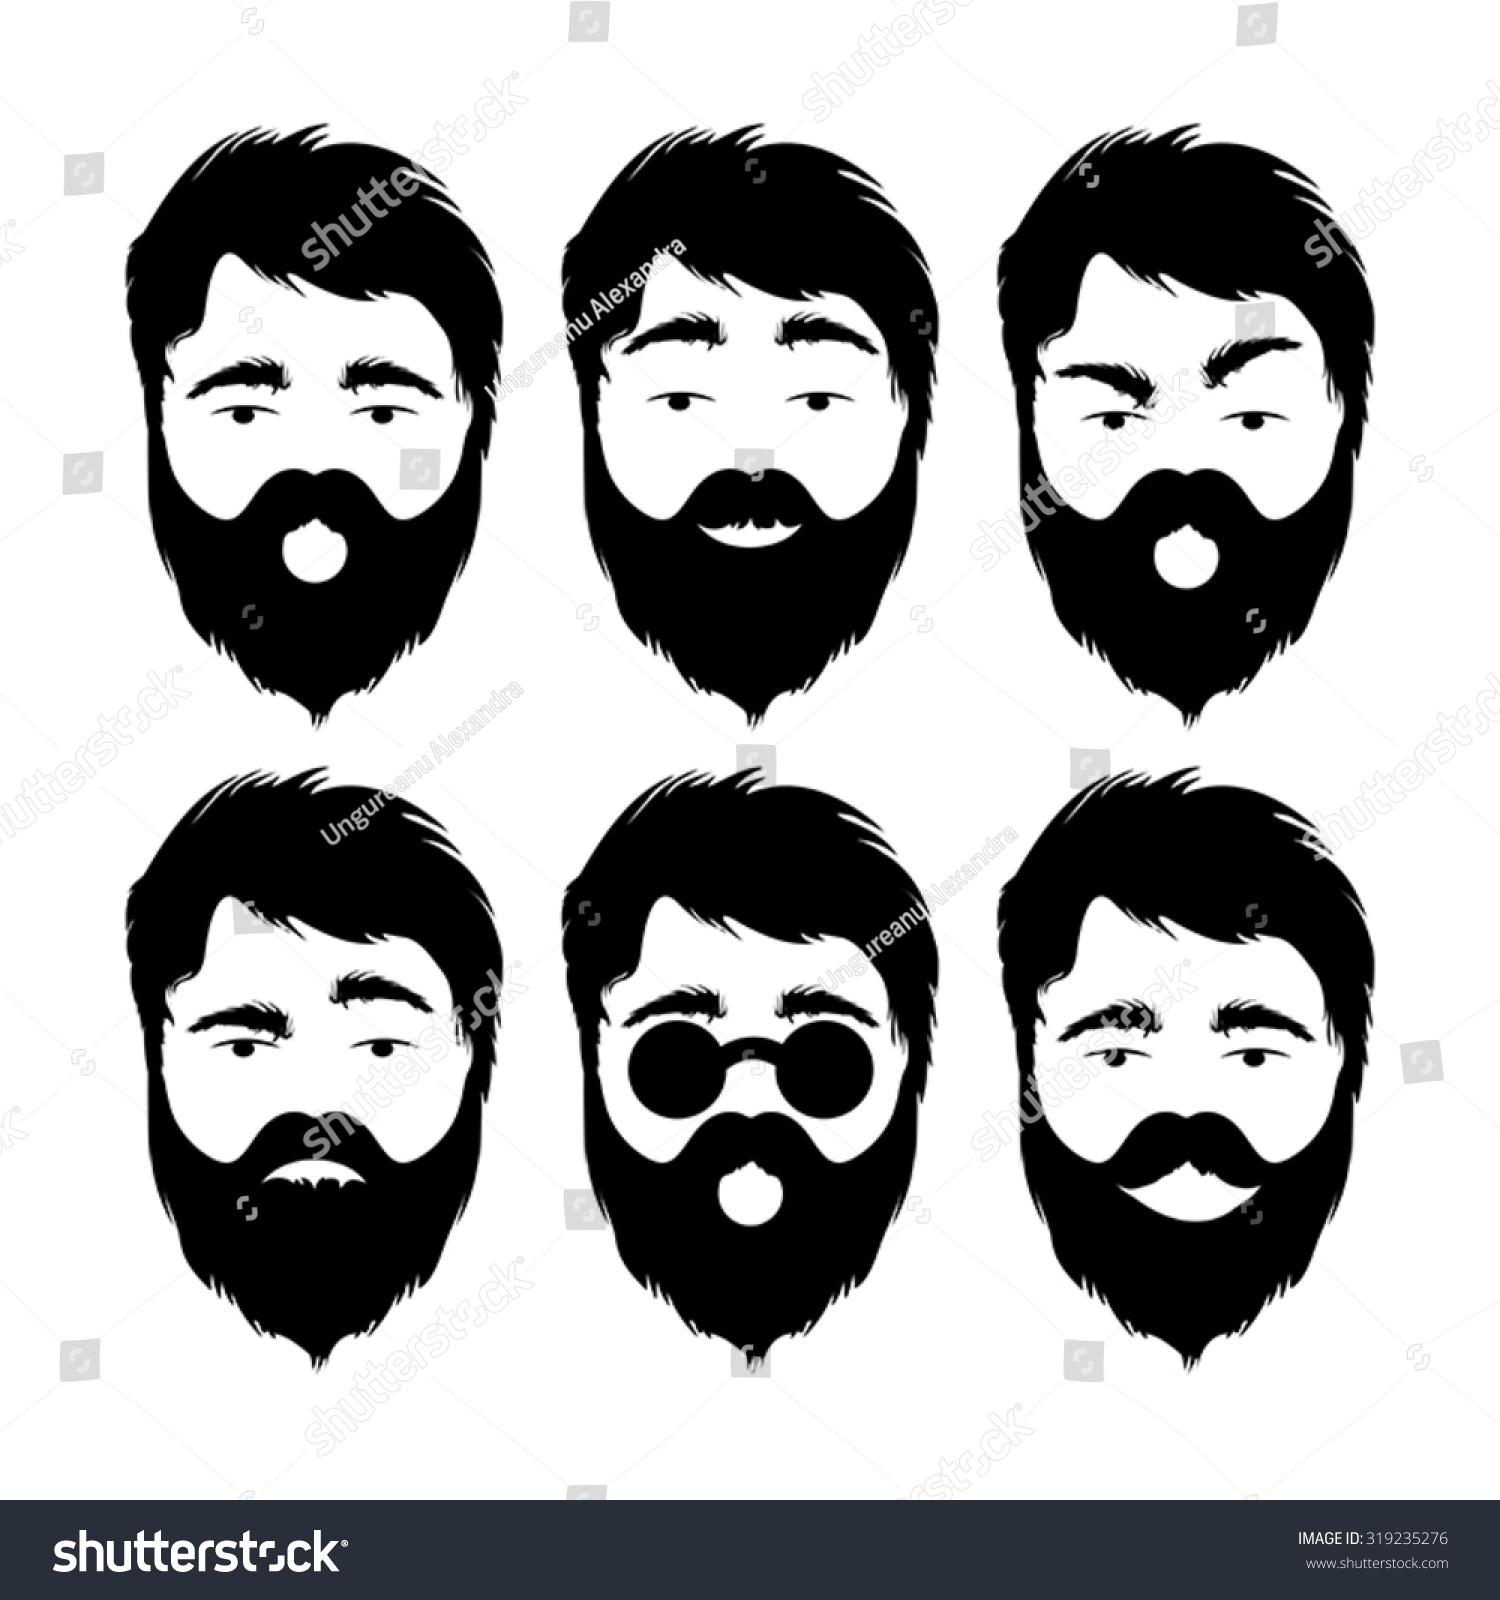 Illustration of modern flat emoticons with beard man isolated on white background